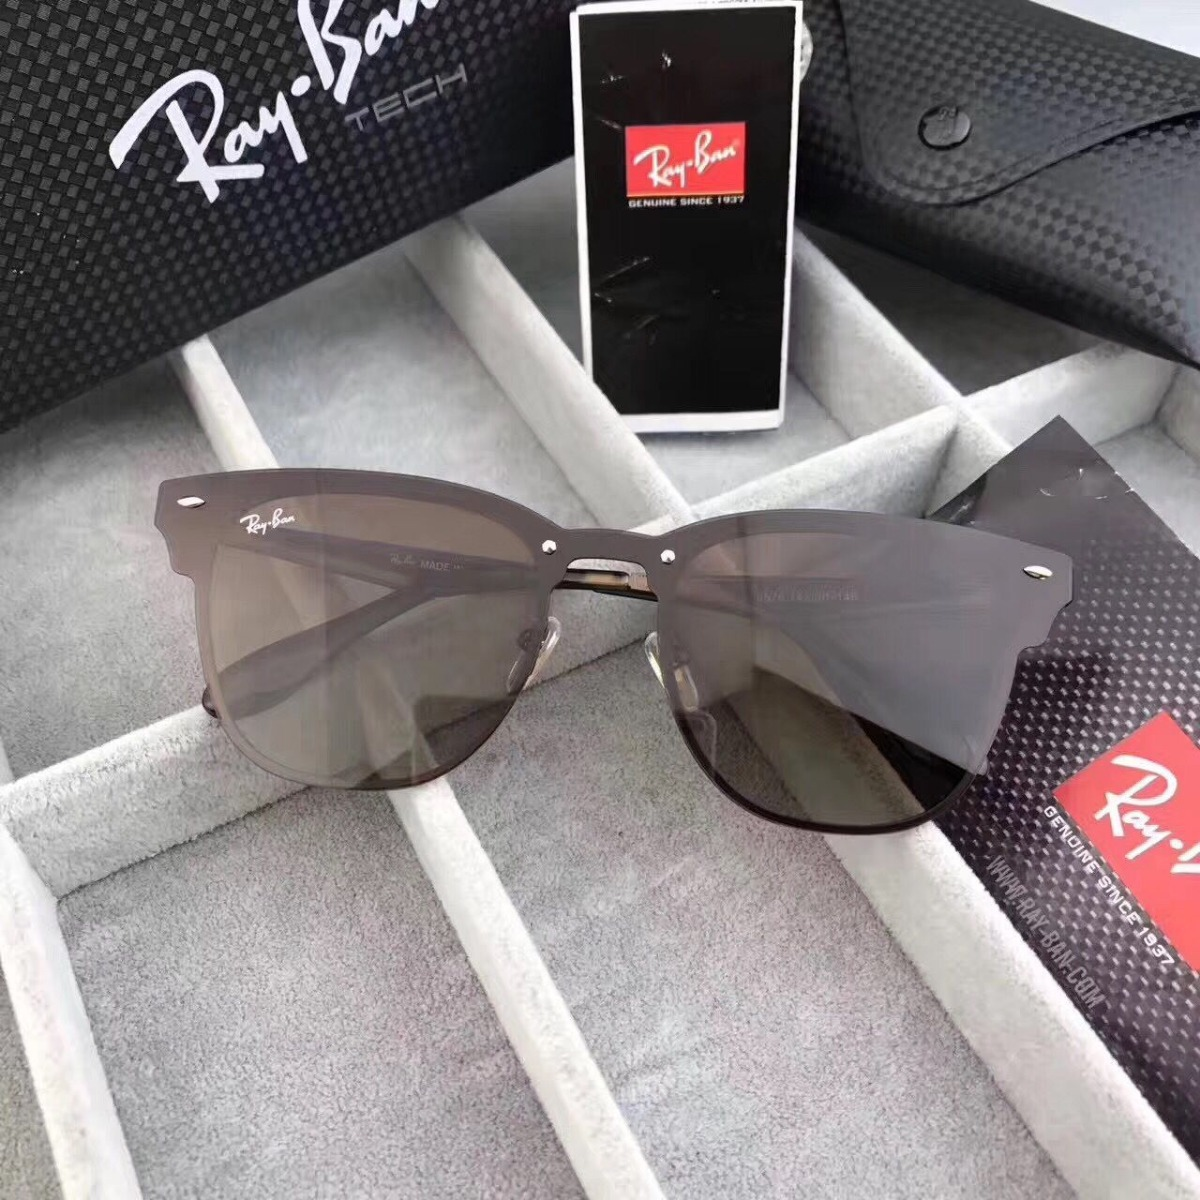 298069551a Ray-ban Blaze Clubmaster Rb3576 Oculos De Sol Caixa Tech - R$ 215,90 ...